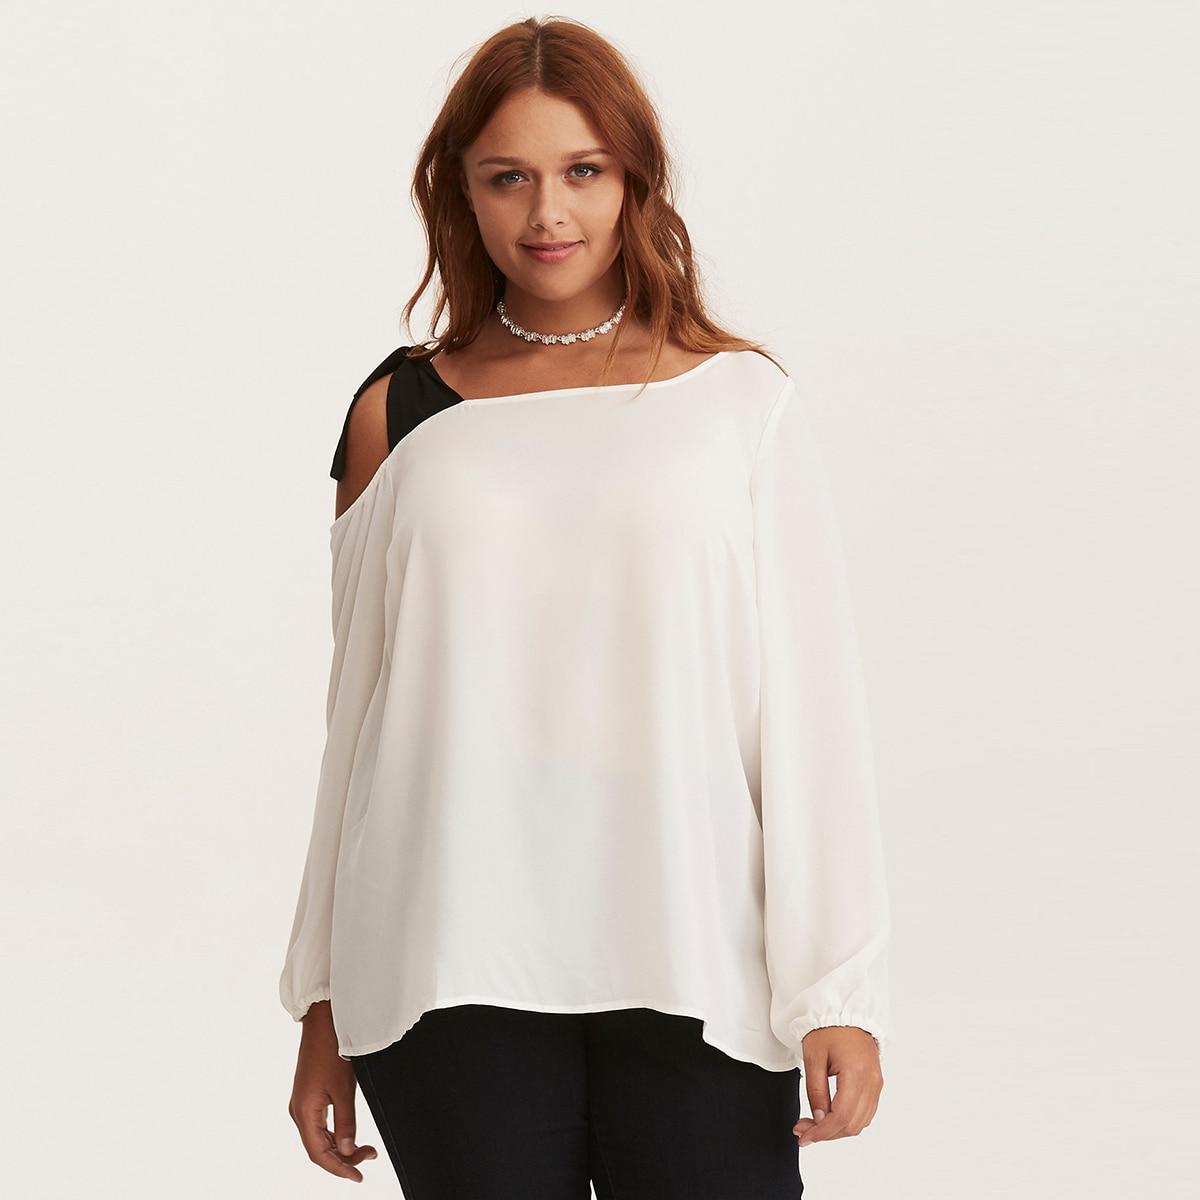 MCO 2018 Spring Sexy Tie One Shoulder Plus Size Women Top Fashion Office Ladies Oversized Blouse Basic OL White Tops 5xl 6xl 7xl 1